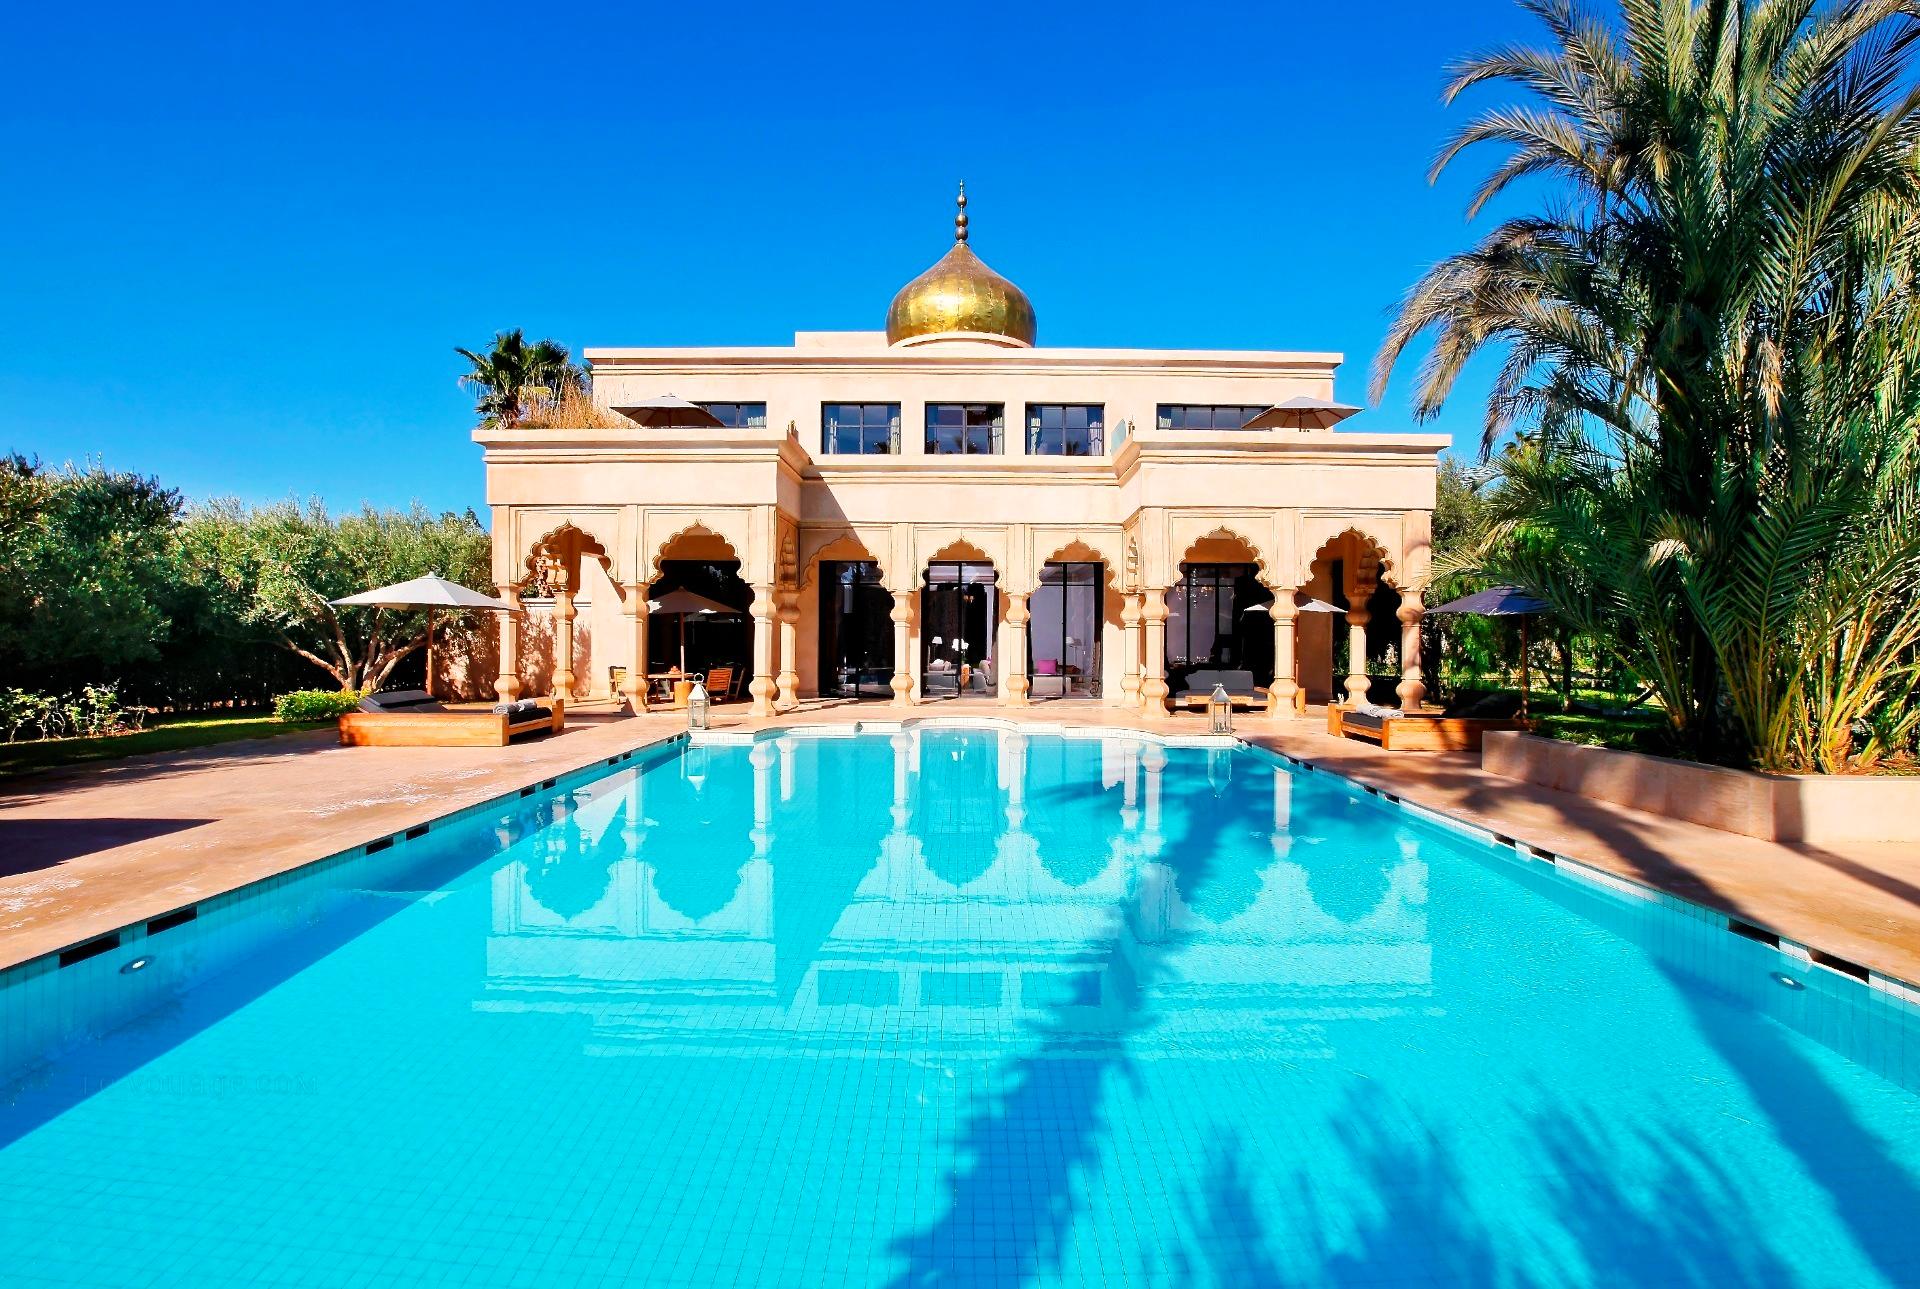 Luxury Namaskar Palace Marrakech